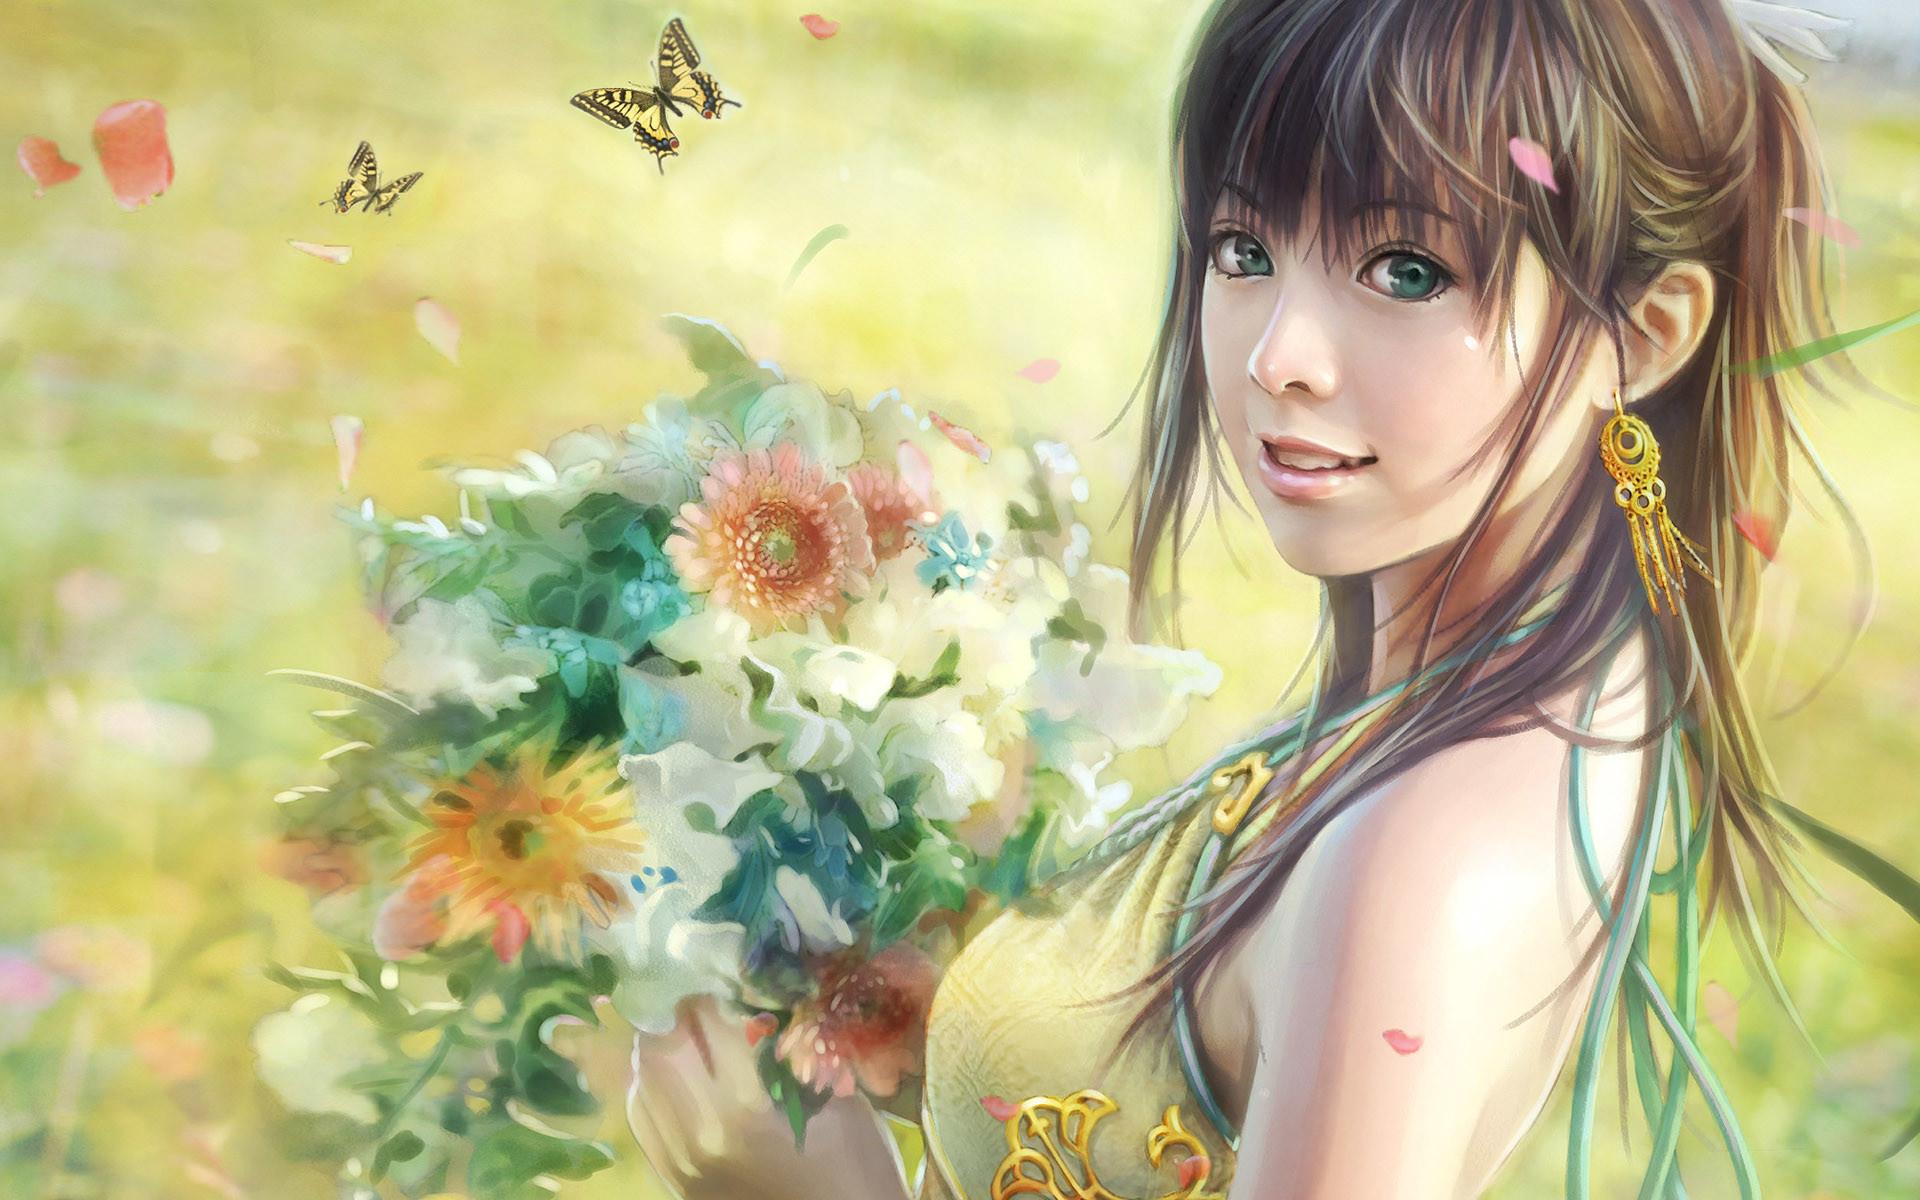 Free CG beautiful girl wallpaper Wallpapers – HD Wallpapers 81317